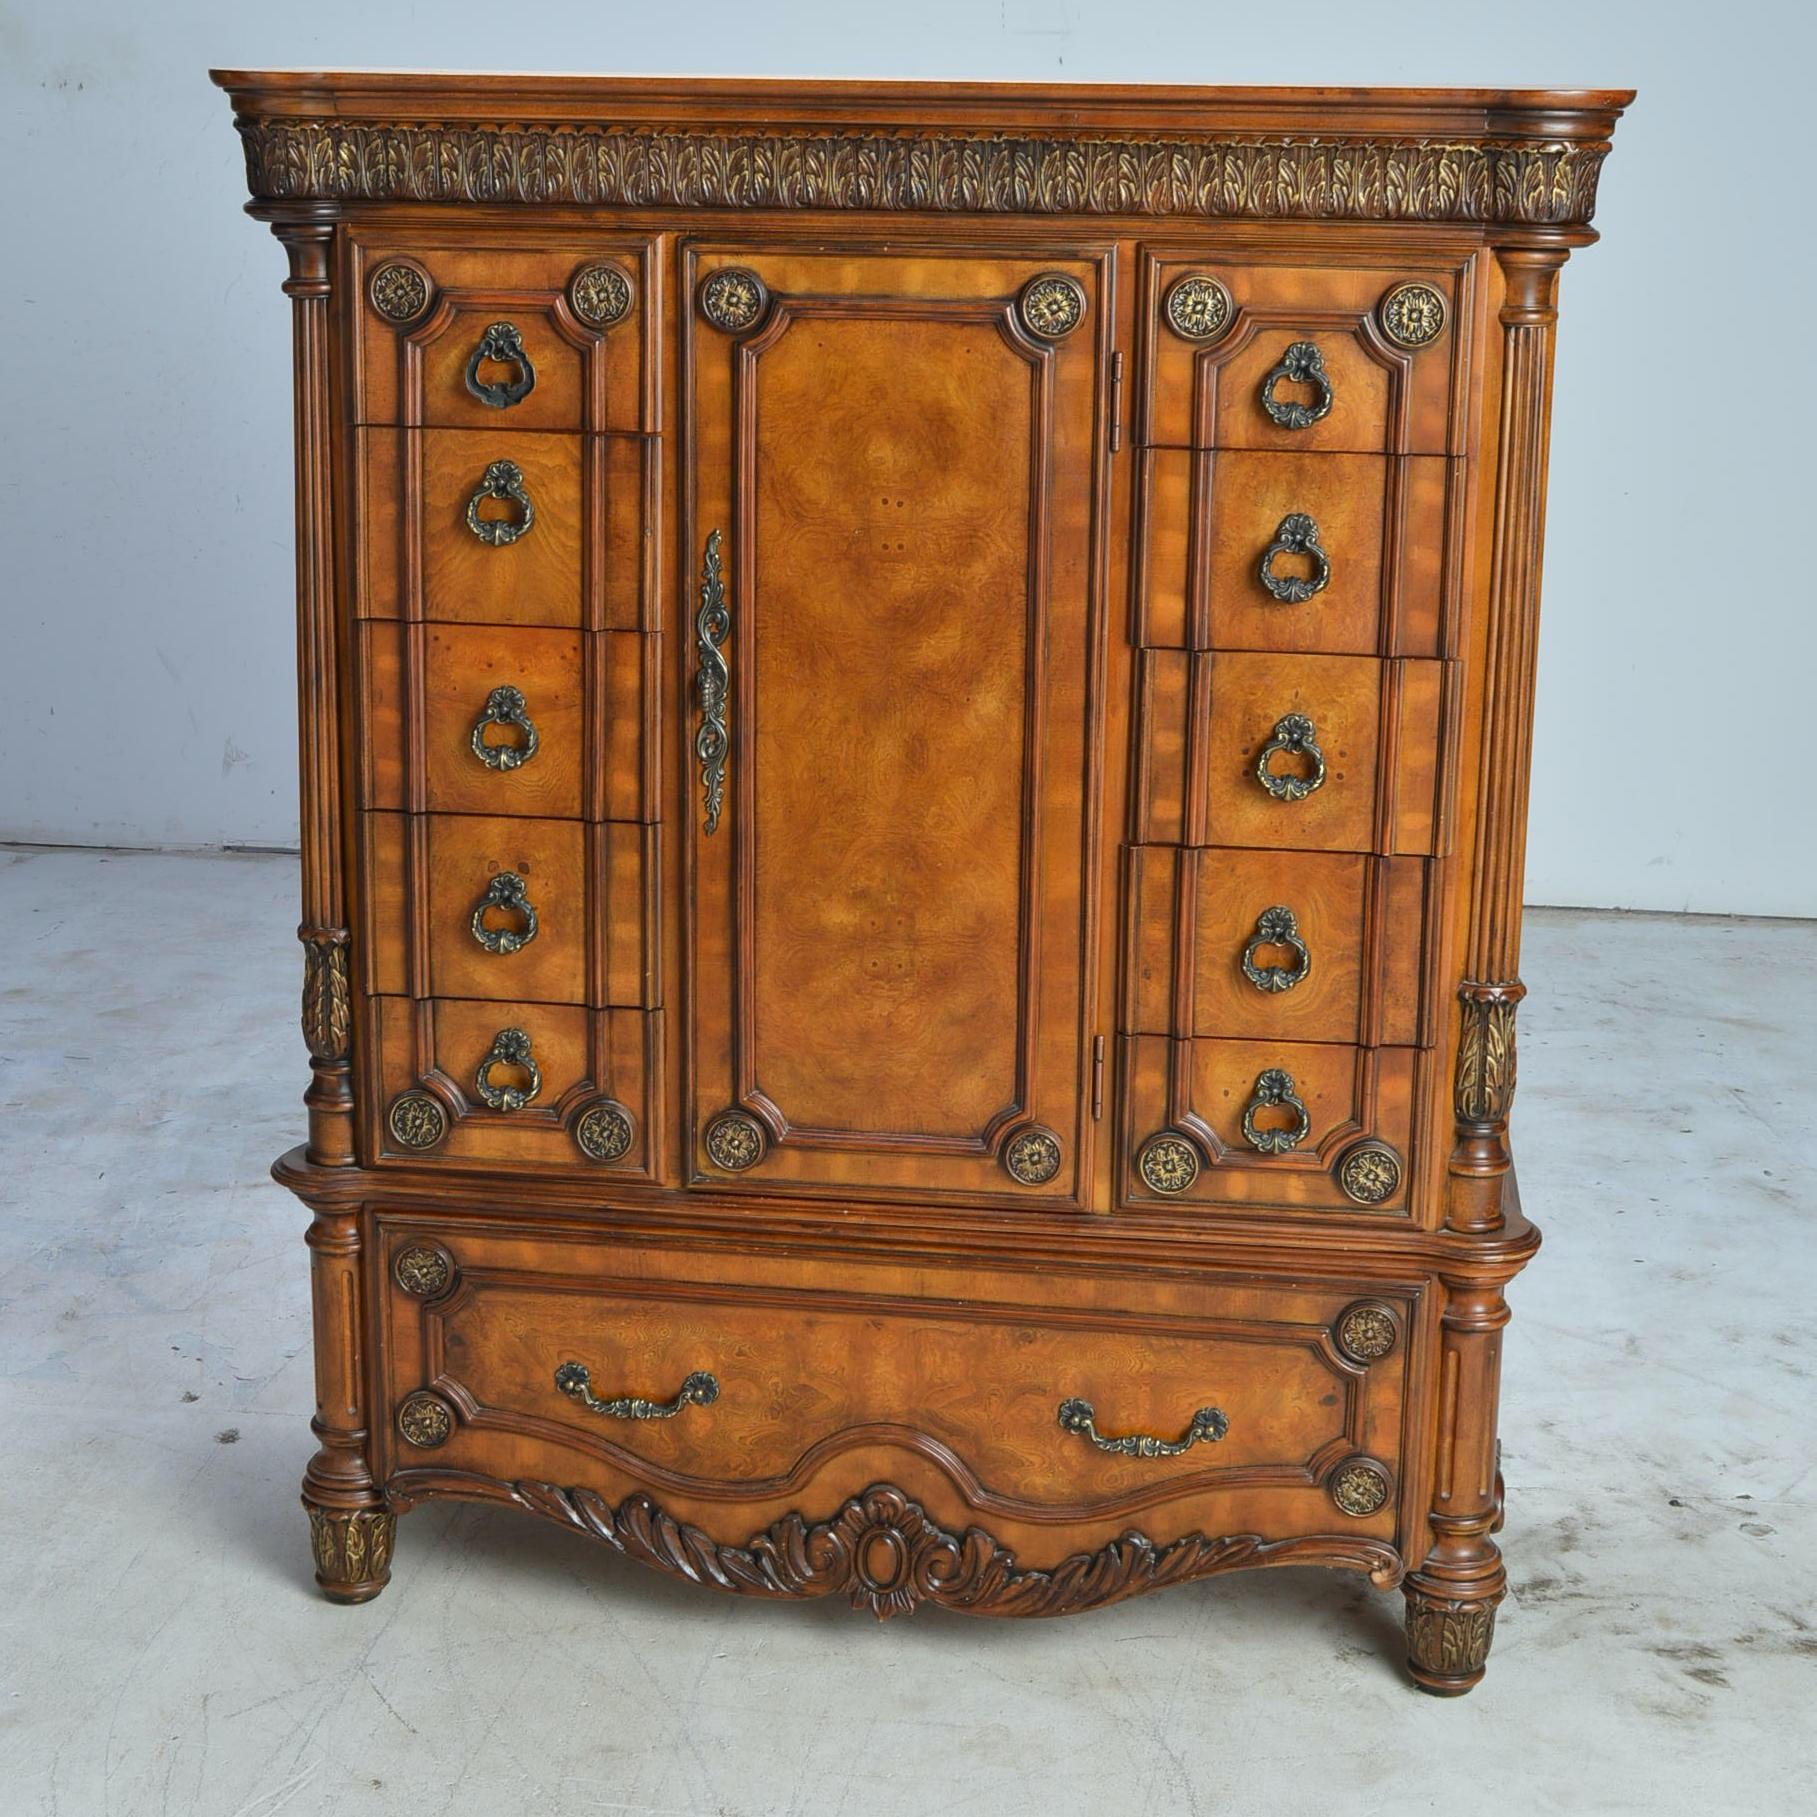 Burled Wood Veneer Armoire by Pulaski Furniture